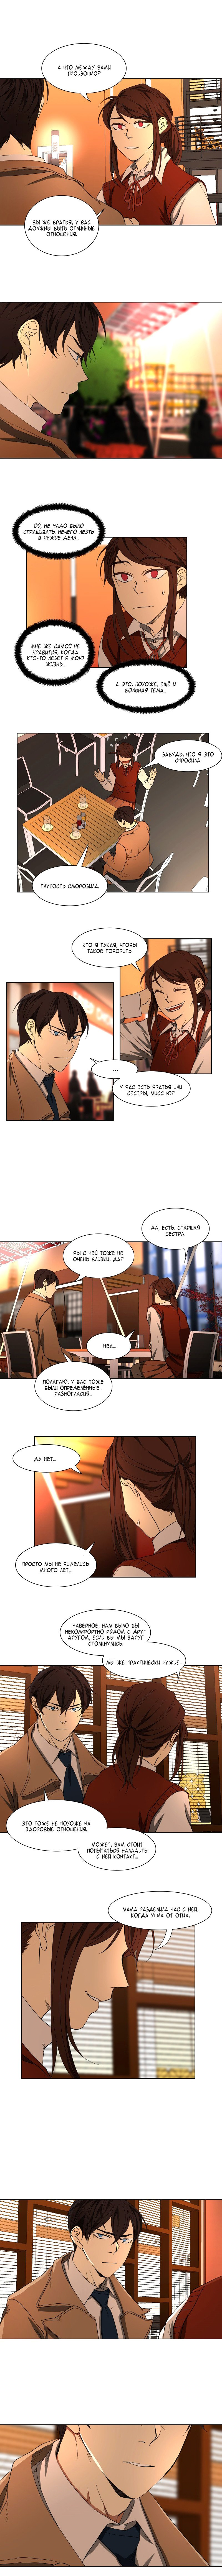 Манга Я люблю Ю / I love Yoo  - Том 1 Глава 26 Страница 7